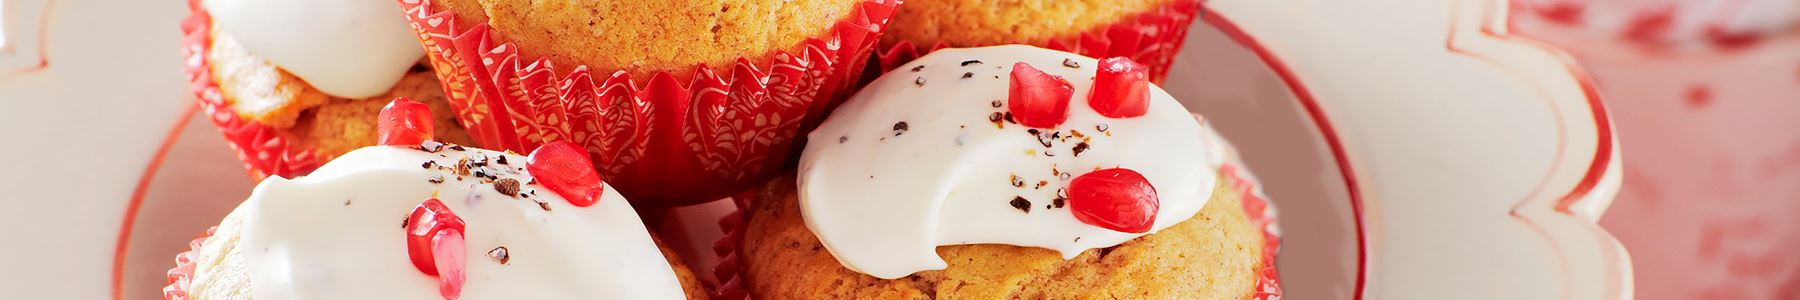 Vanilj + Muffins + Kräm